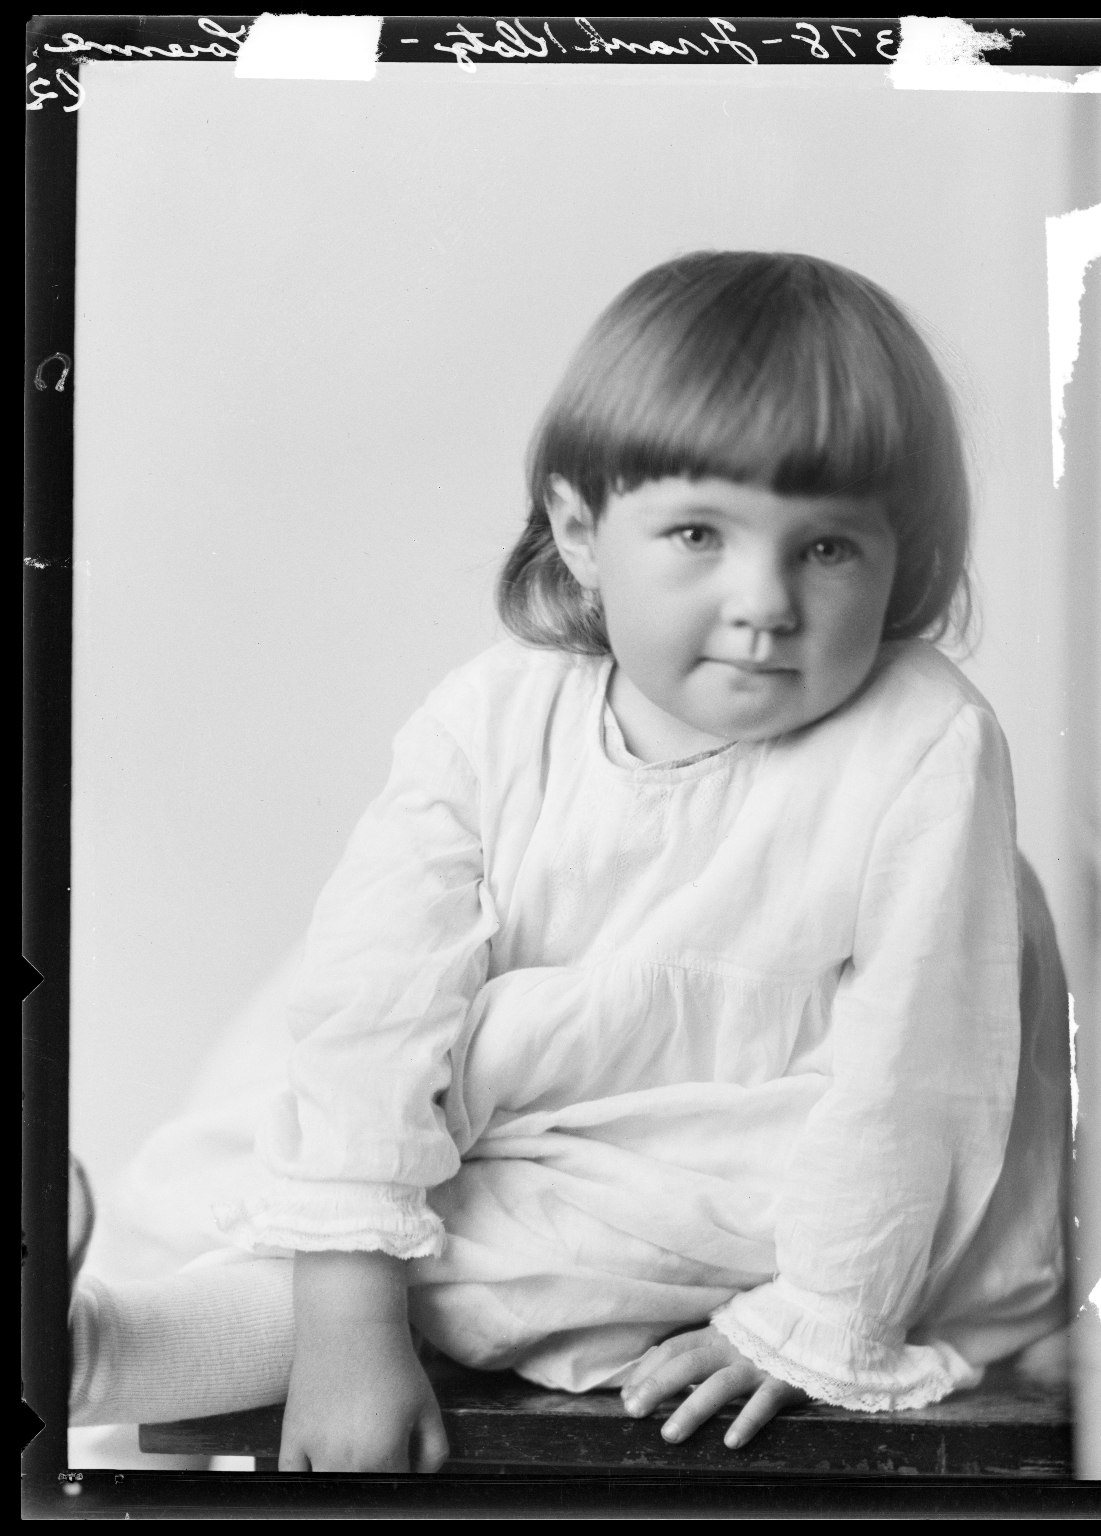 Portraits of child of Frank Klotz